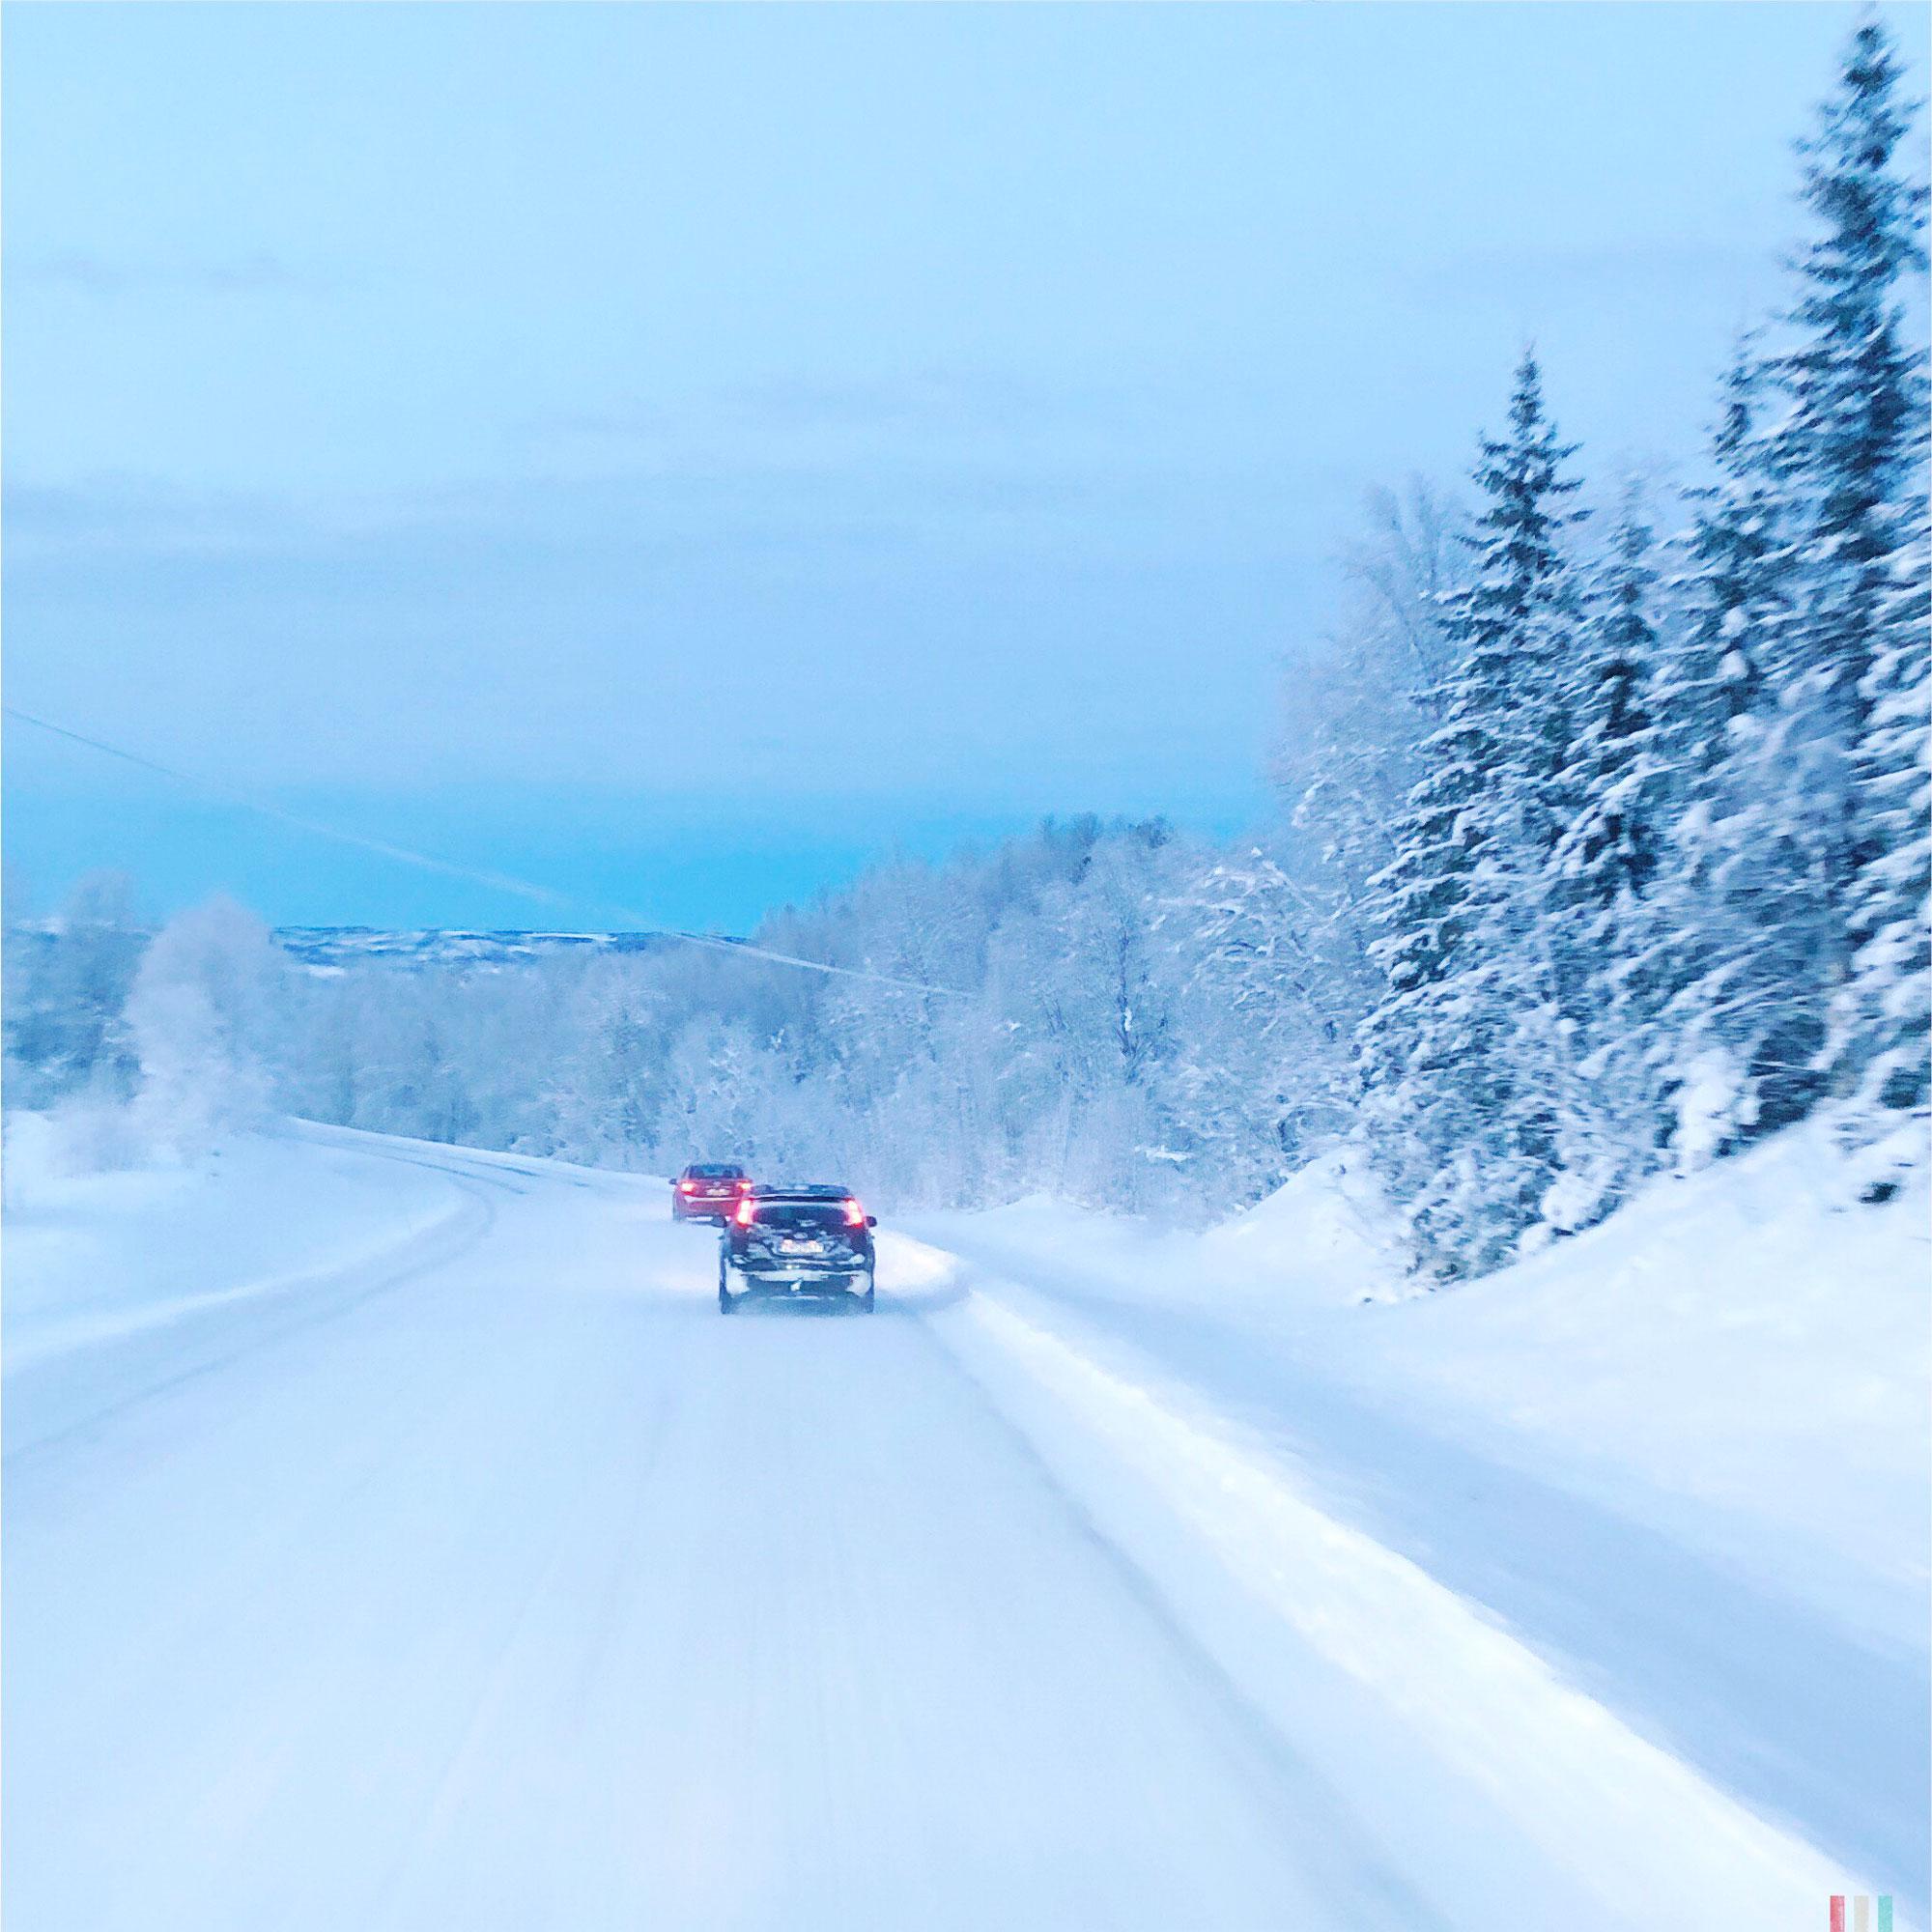 norwegen-tromso-road-trip-11-uhr.jpg